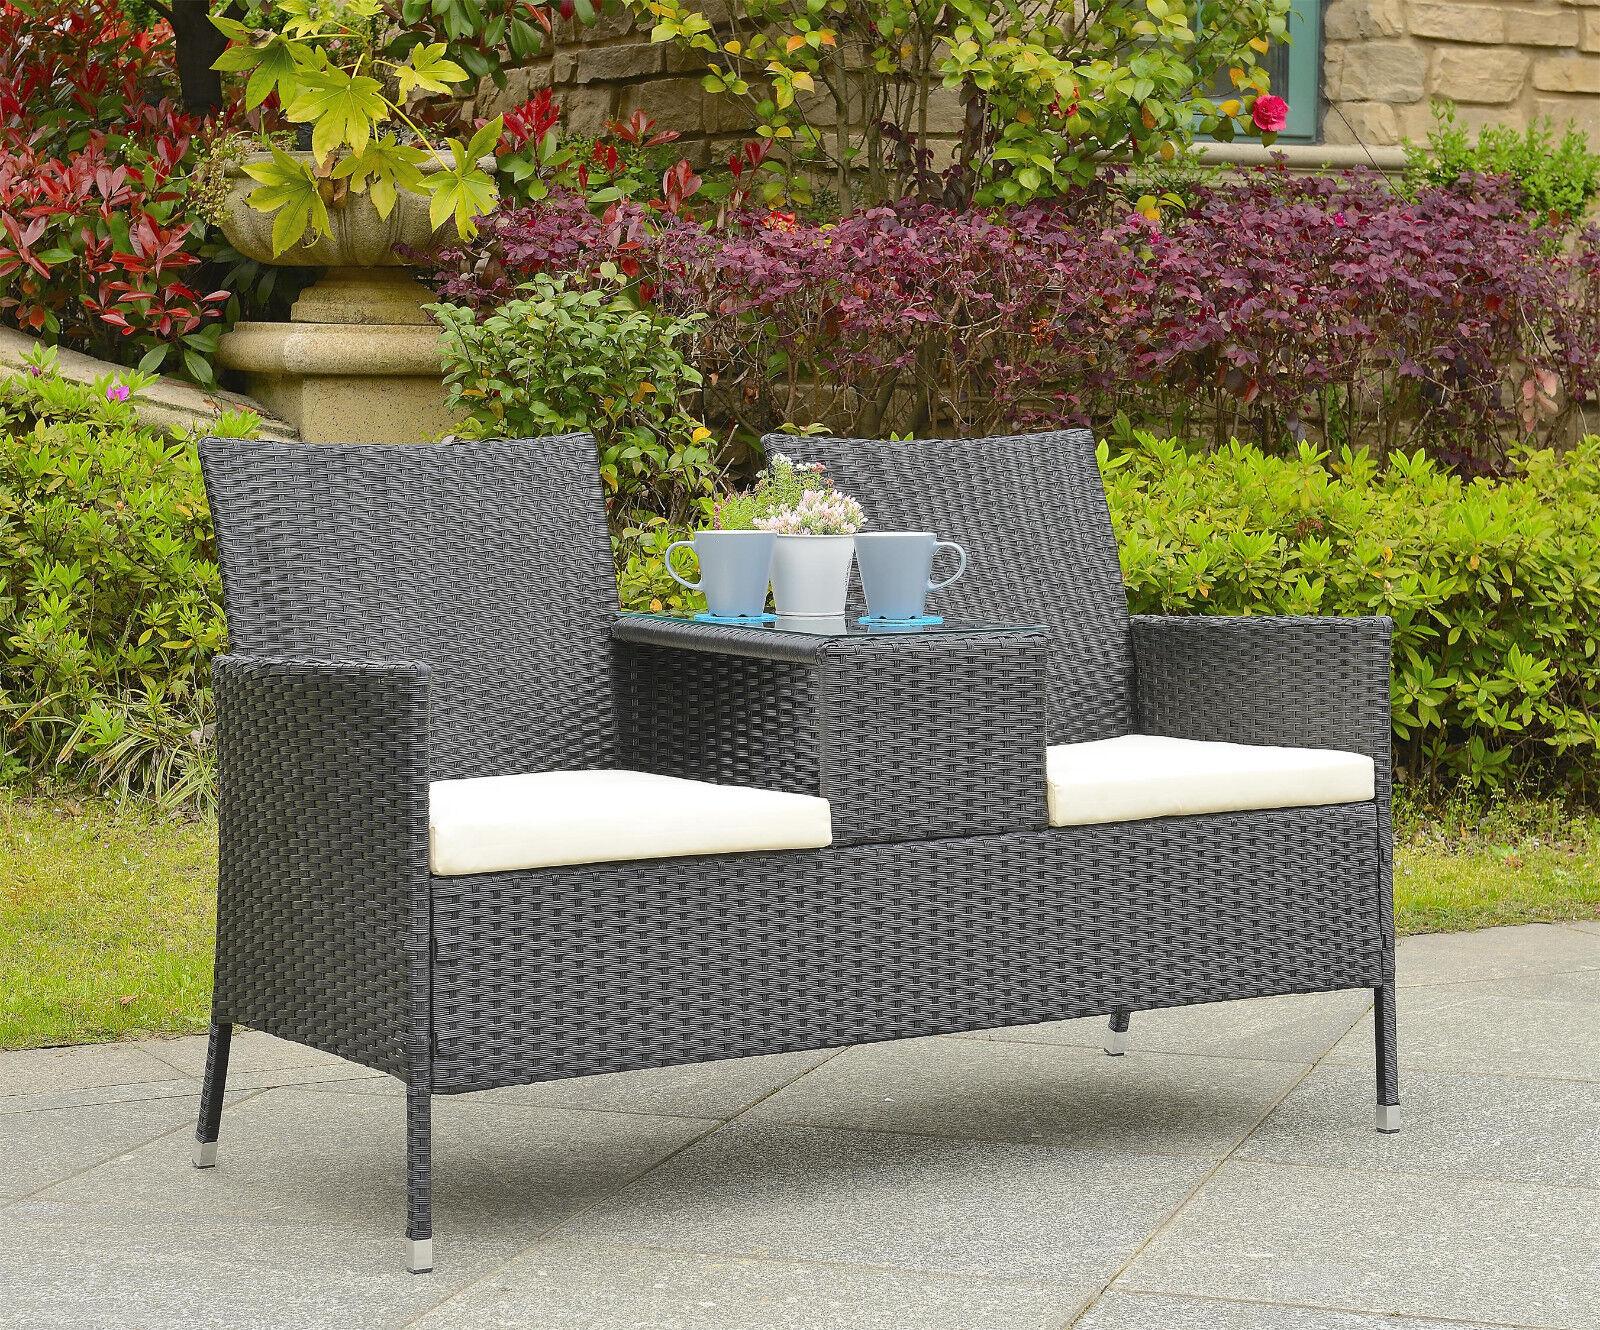 Garden Furniture - Rattan Loveseat 2 Seater Chair Glass Table Patio Companion Garden Furniture Set